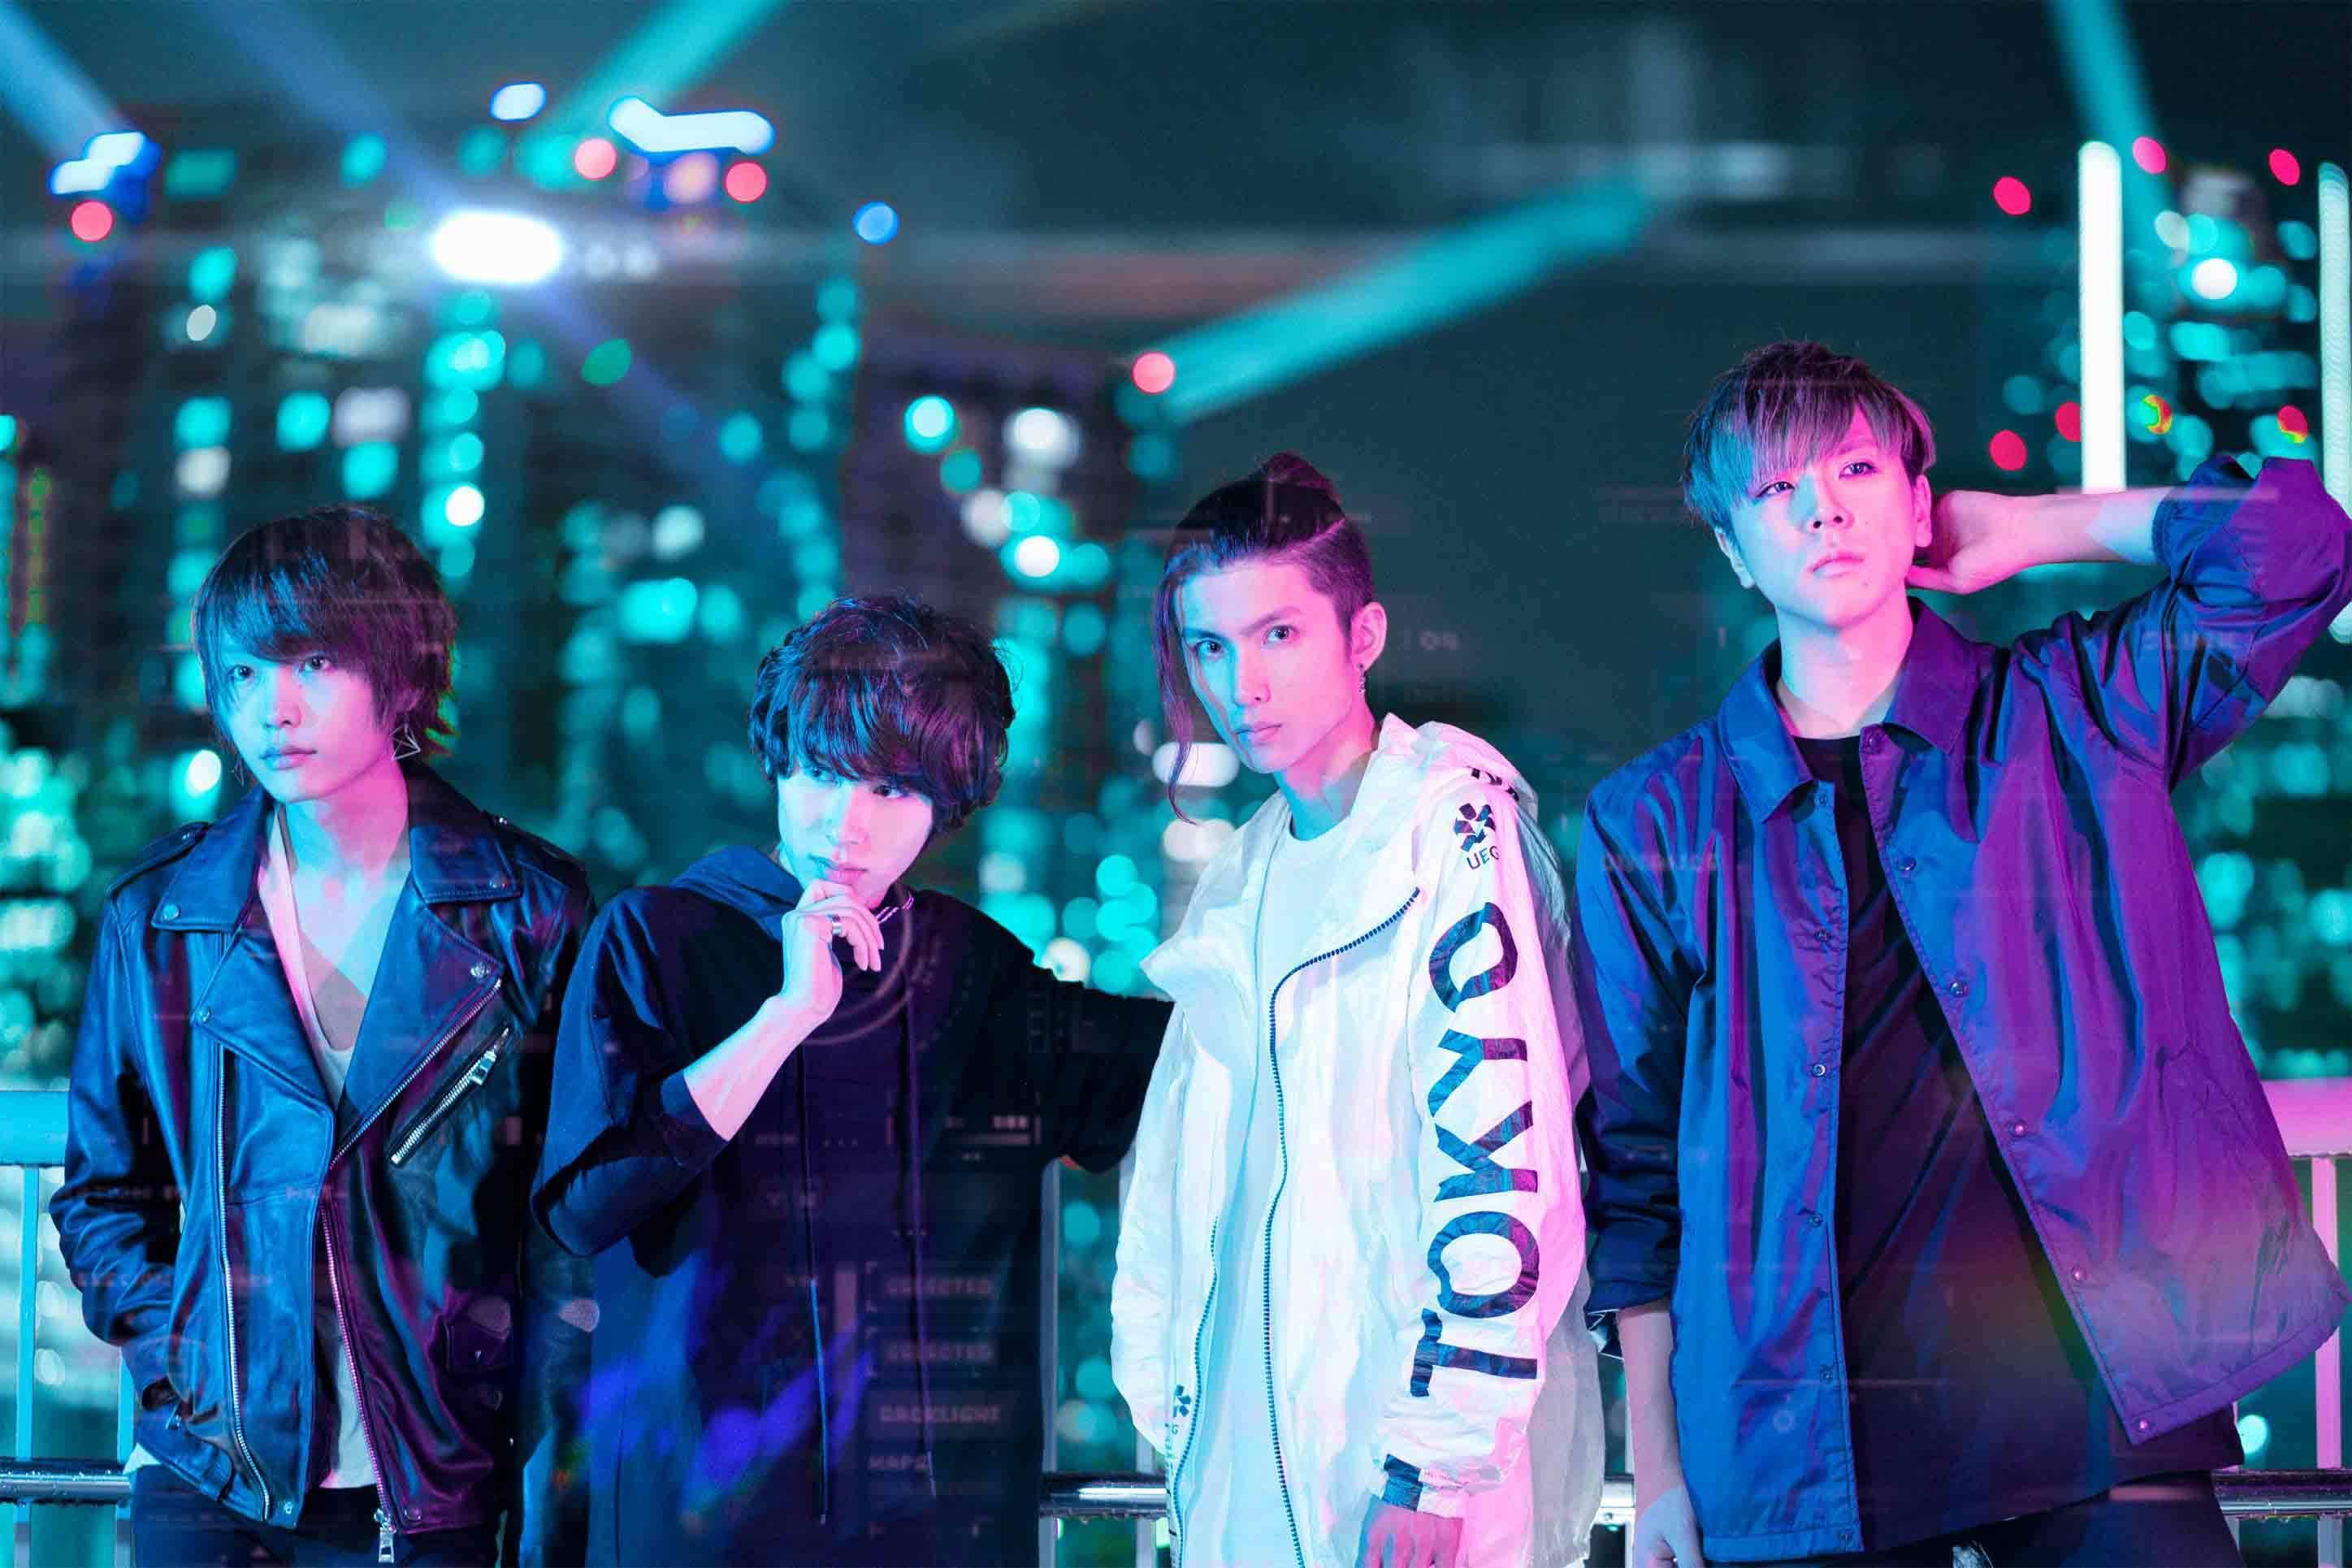 <【THE SIXTH LIE】出演バンドサイン入り色紙プラン>